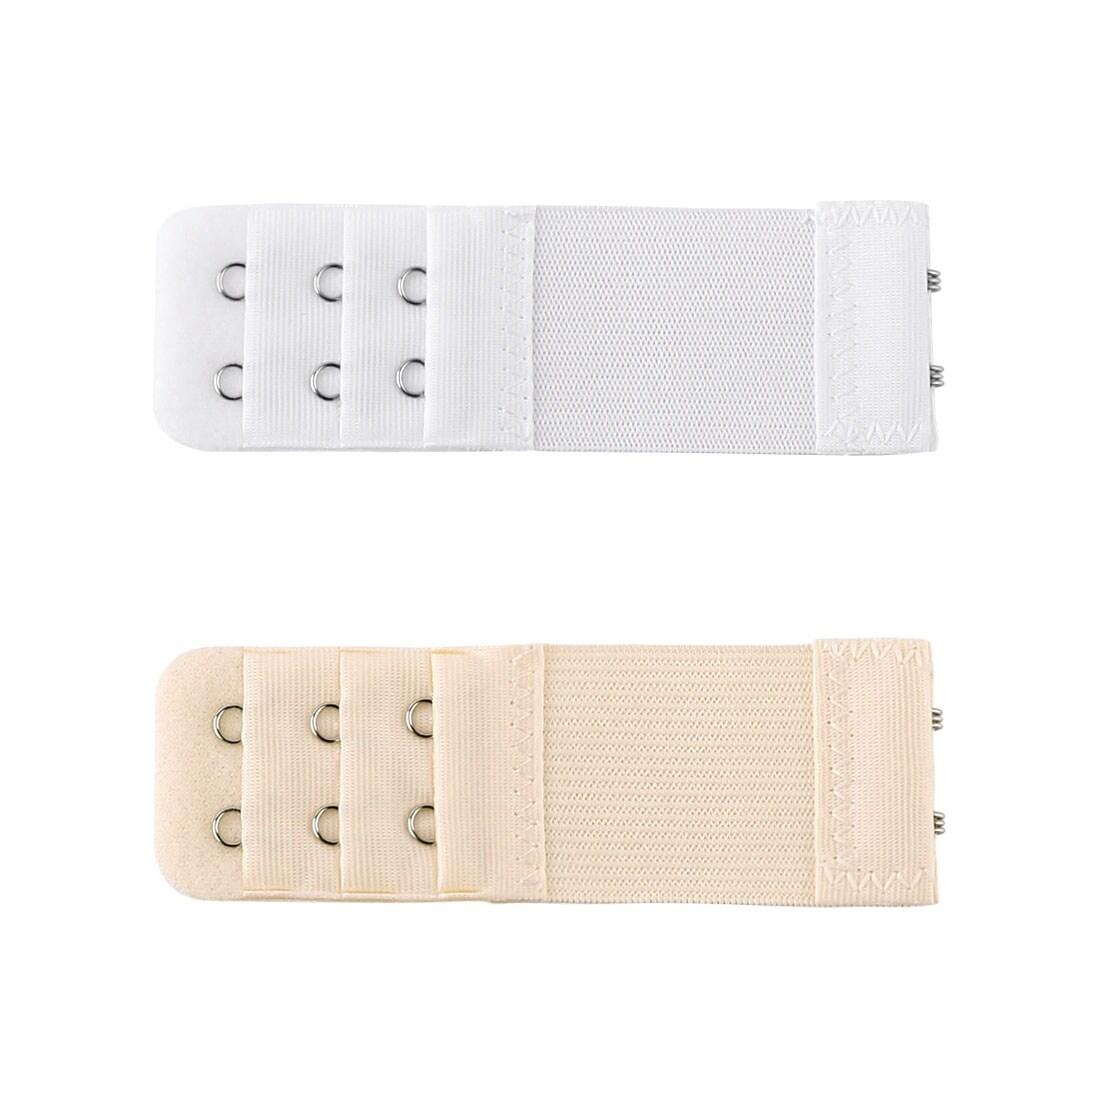 3 x black, 3 x white, 3 x beige Four-hook Bra Extender 9-pack